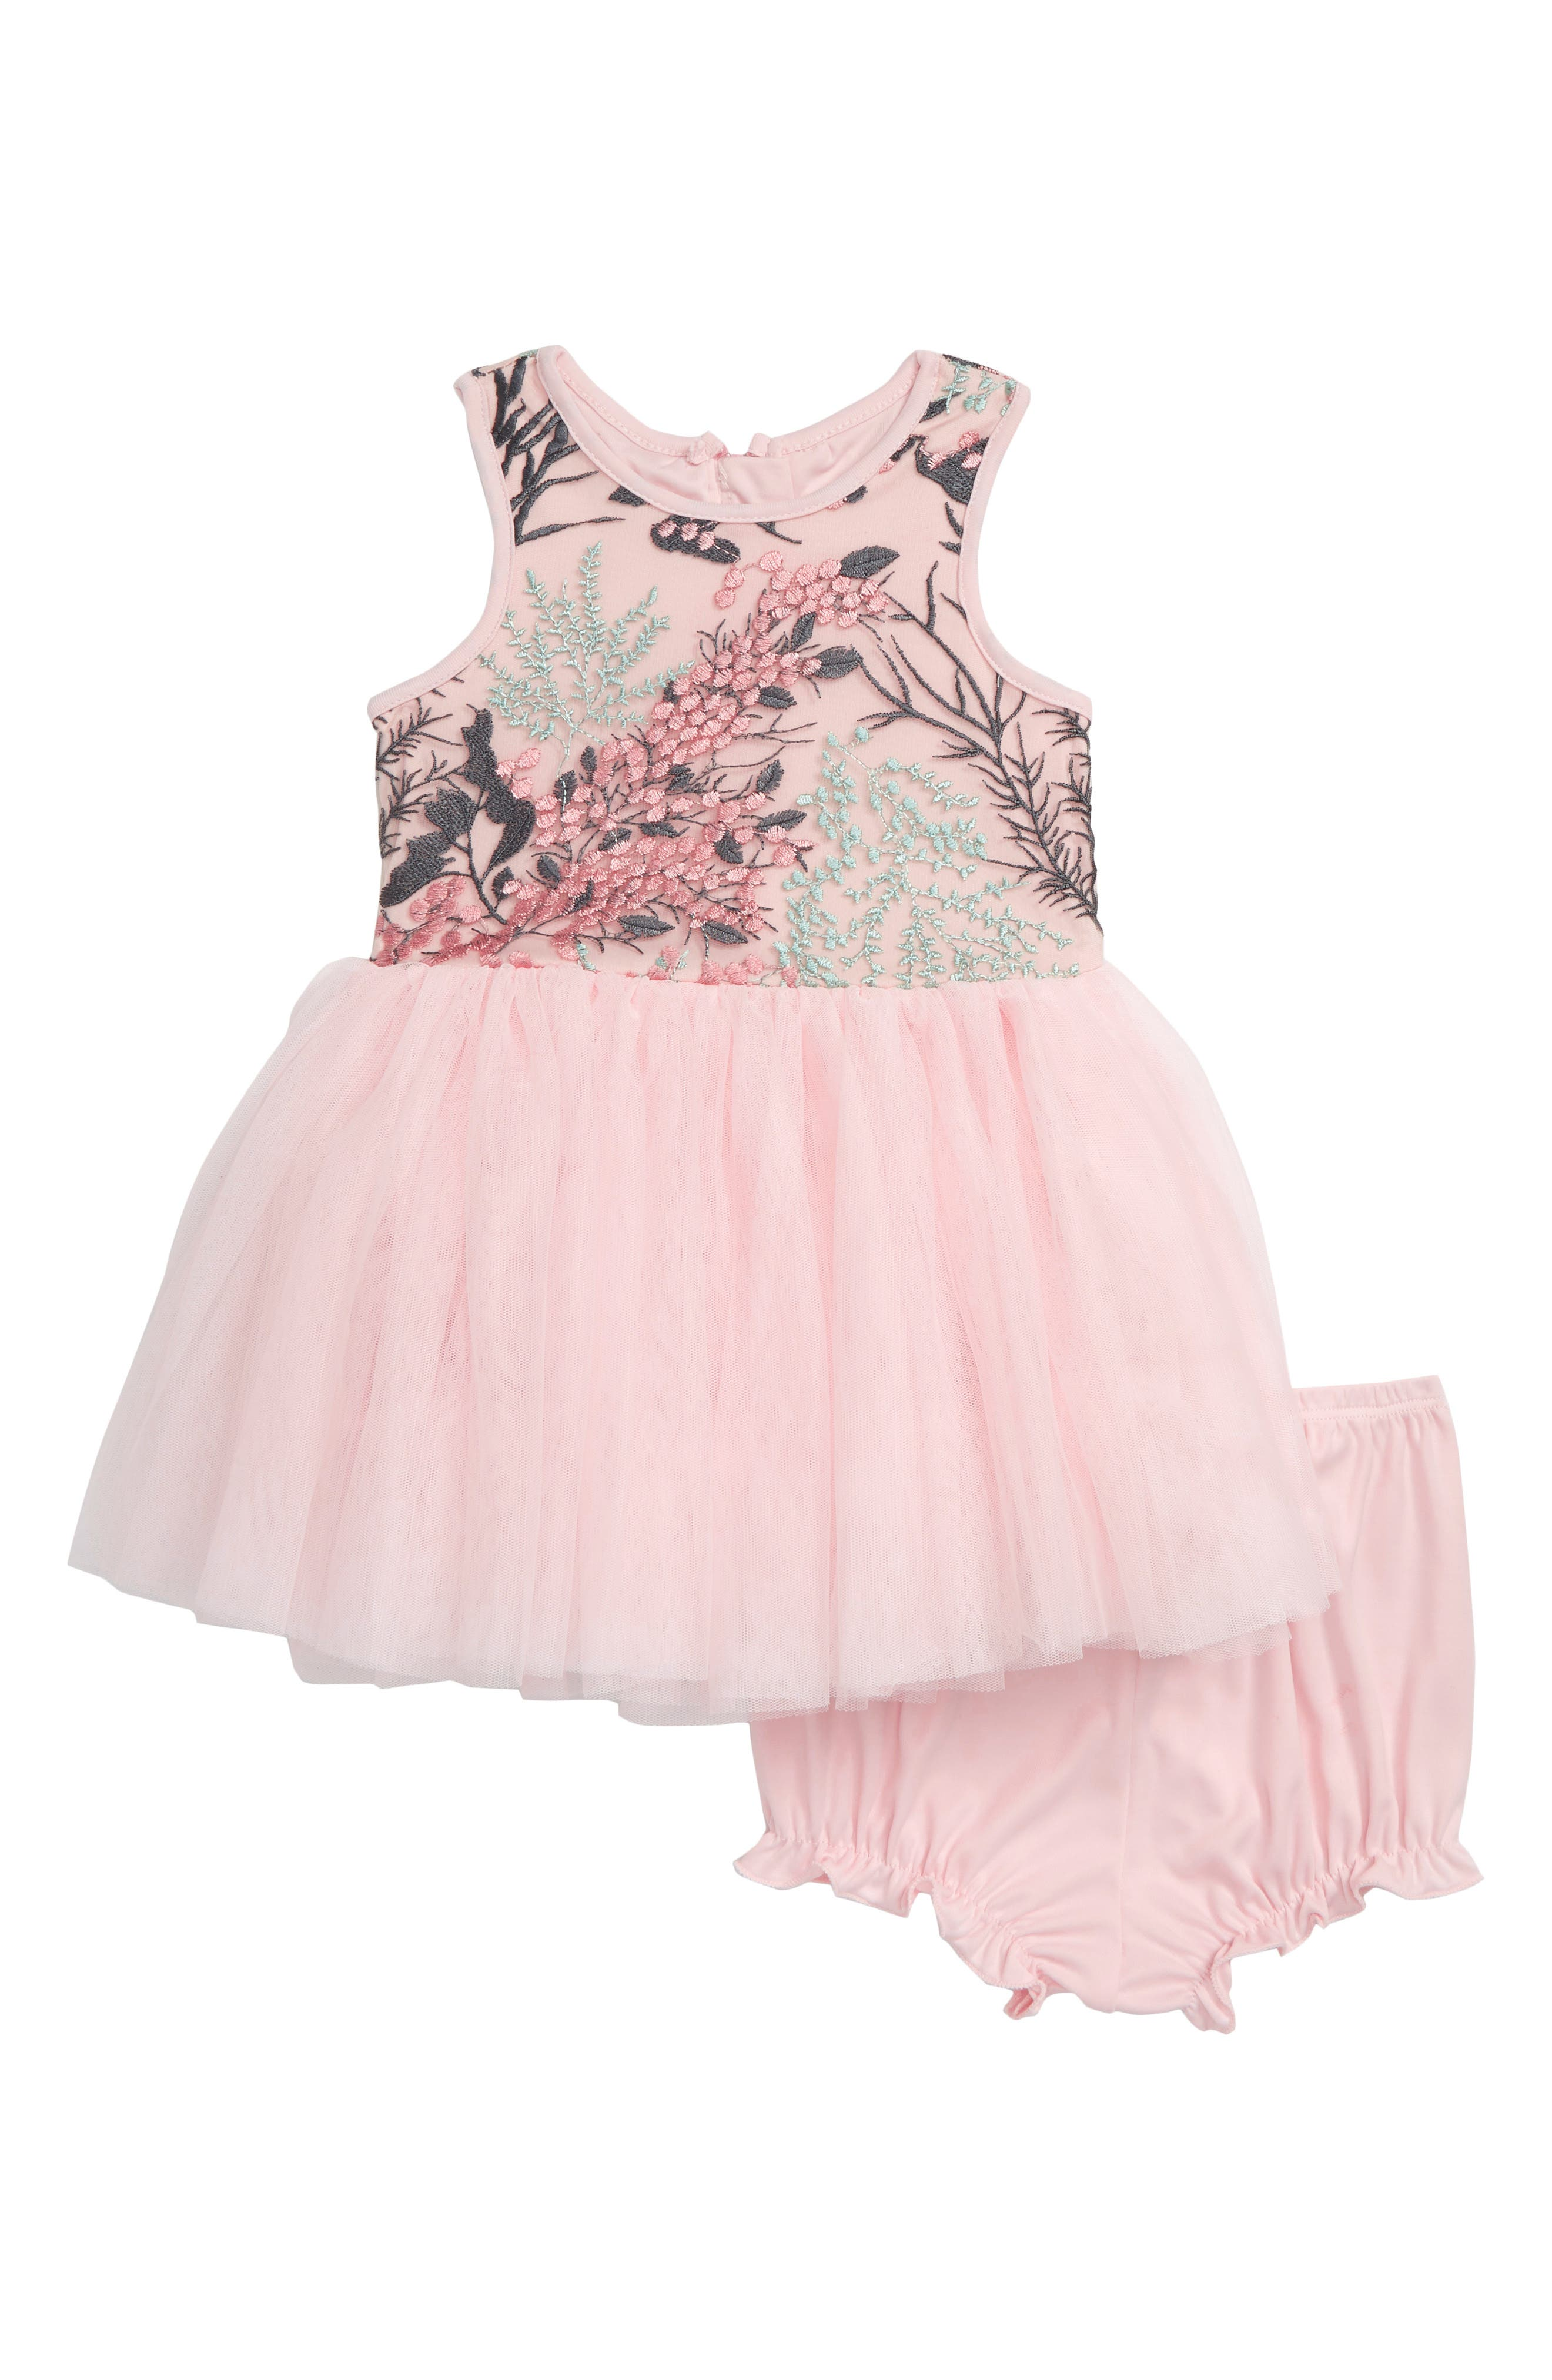 Embroidered Tutu Dress,                         Main,                         color, BEIGE